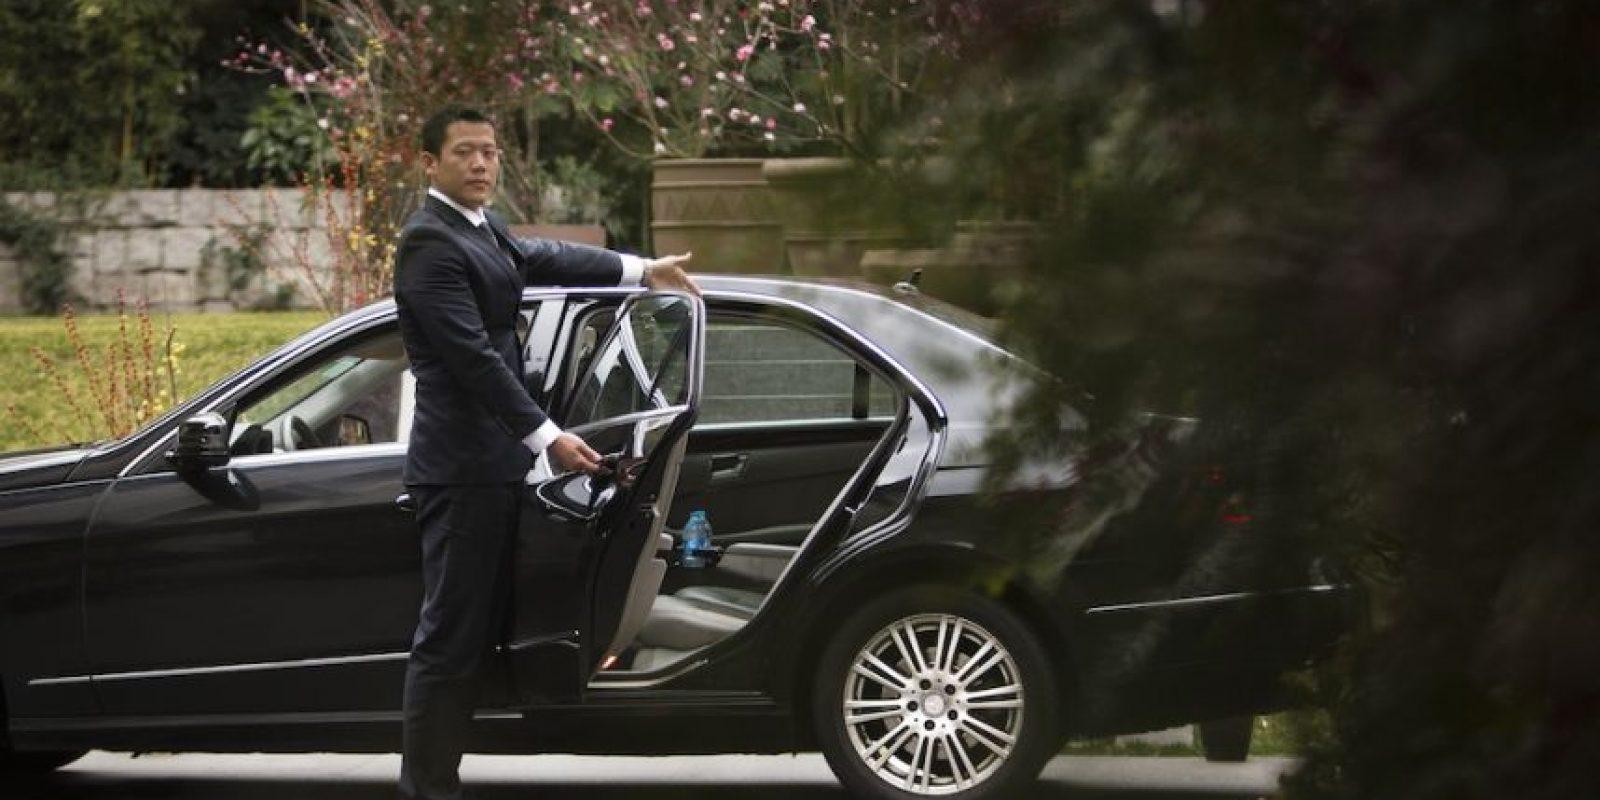 9- Faltarles el respeto Foto:Uber